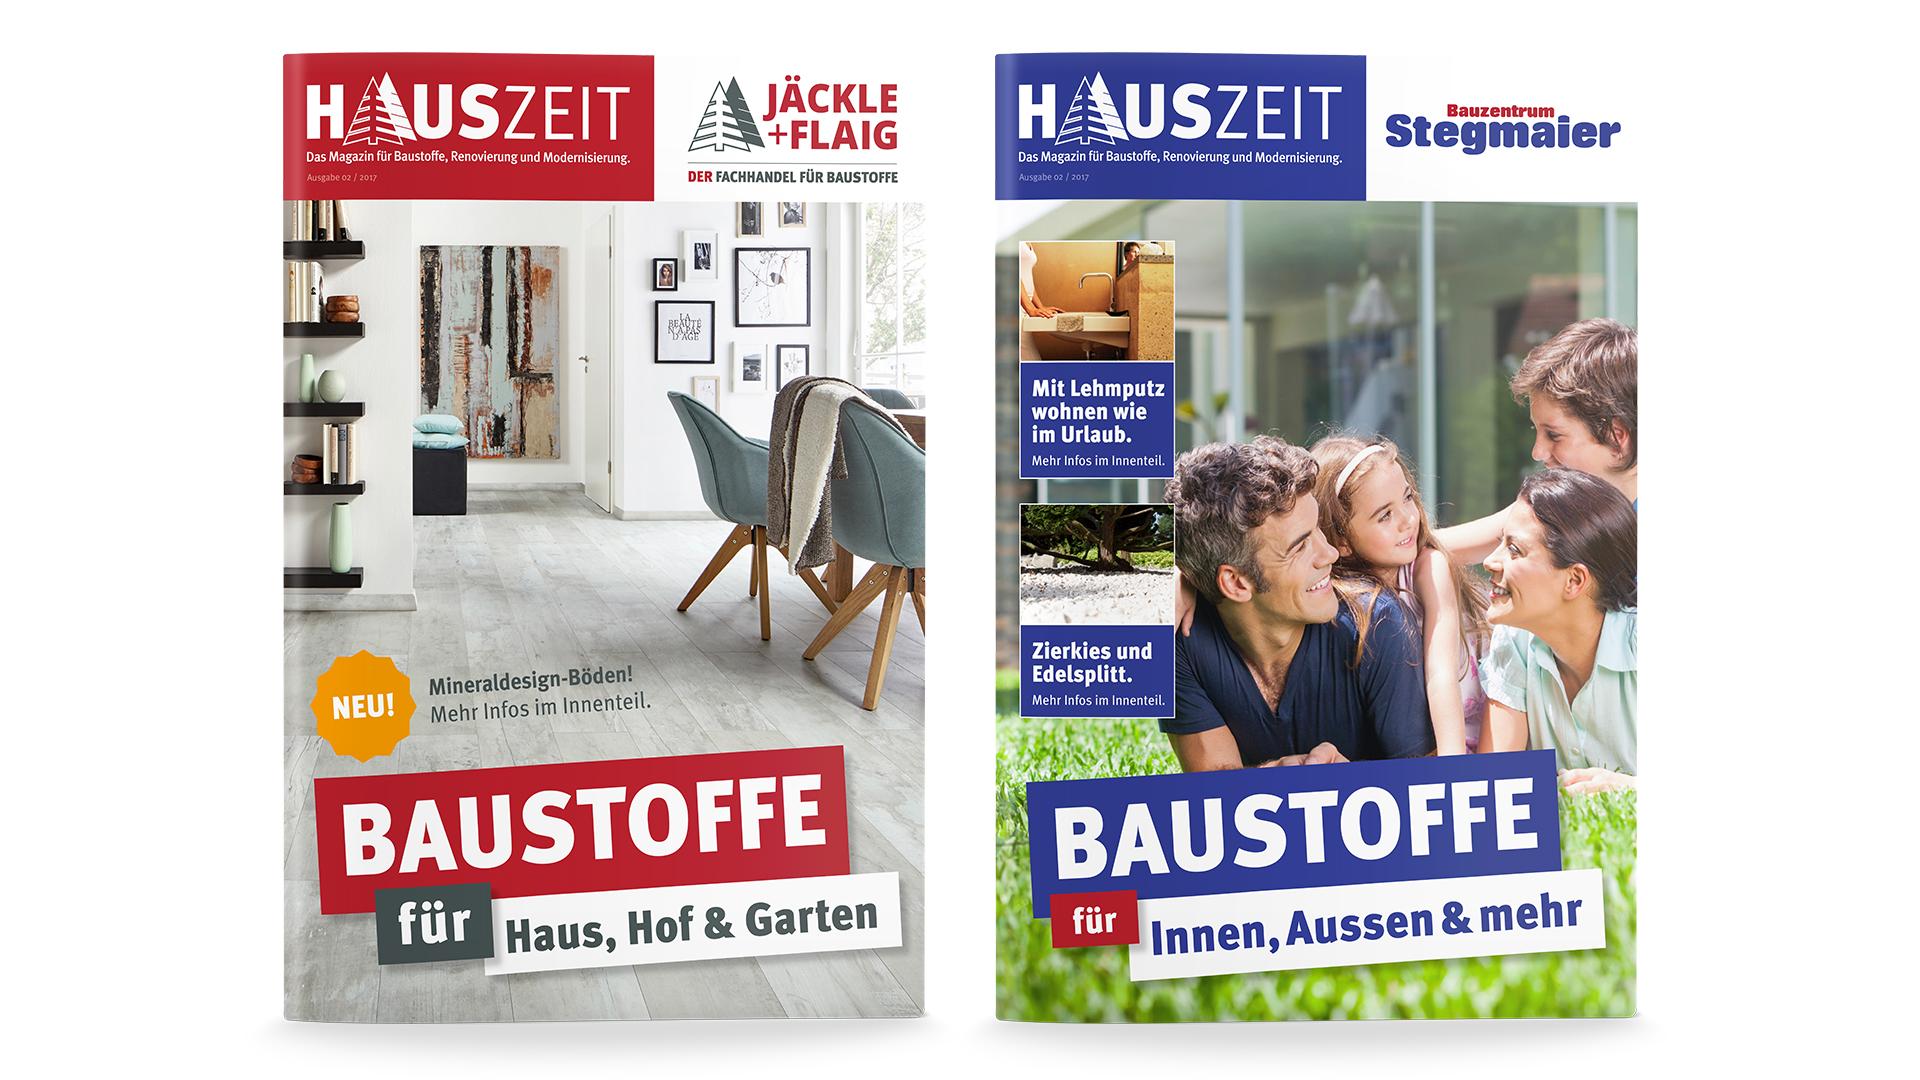 Jäckle + Flaig Firmengruppe